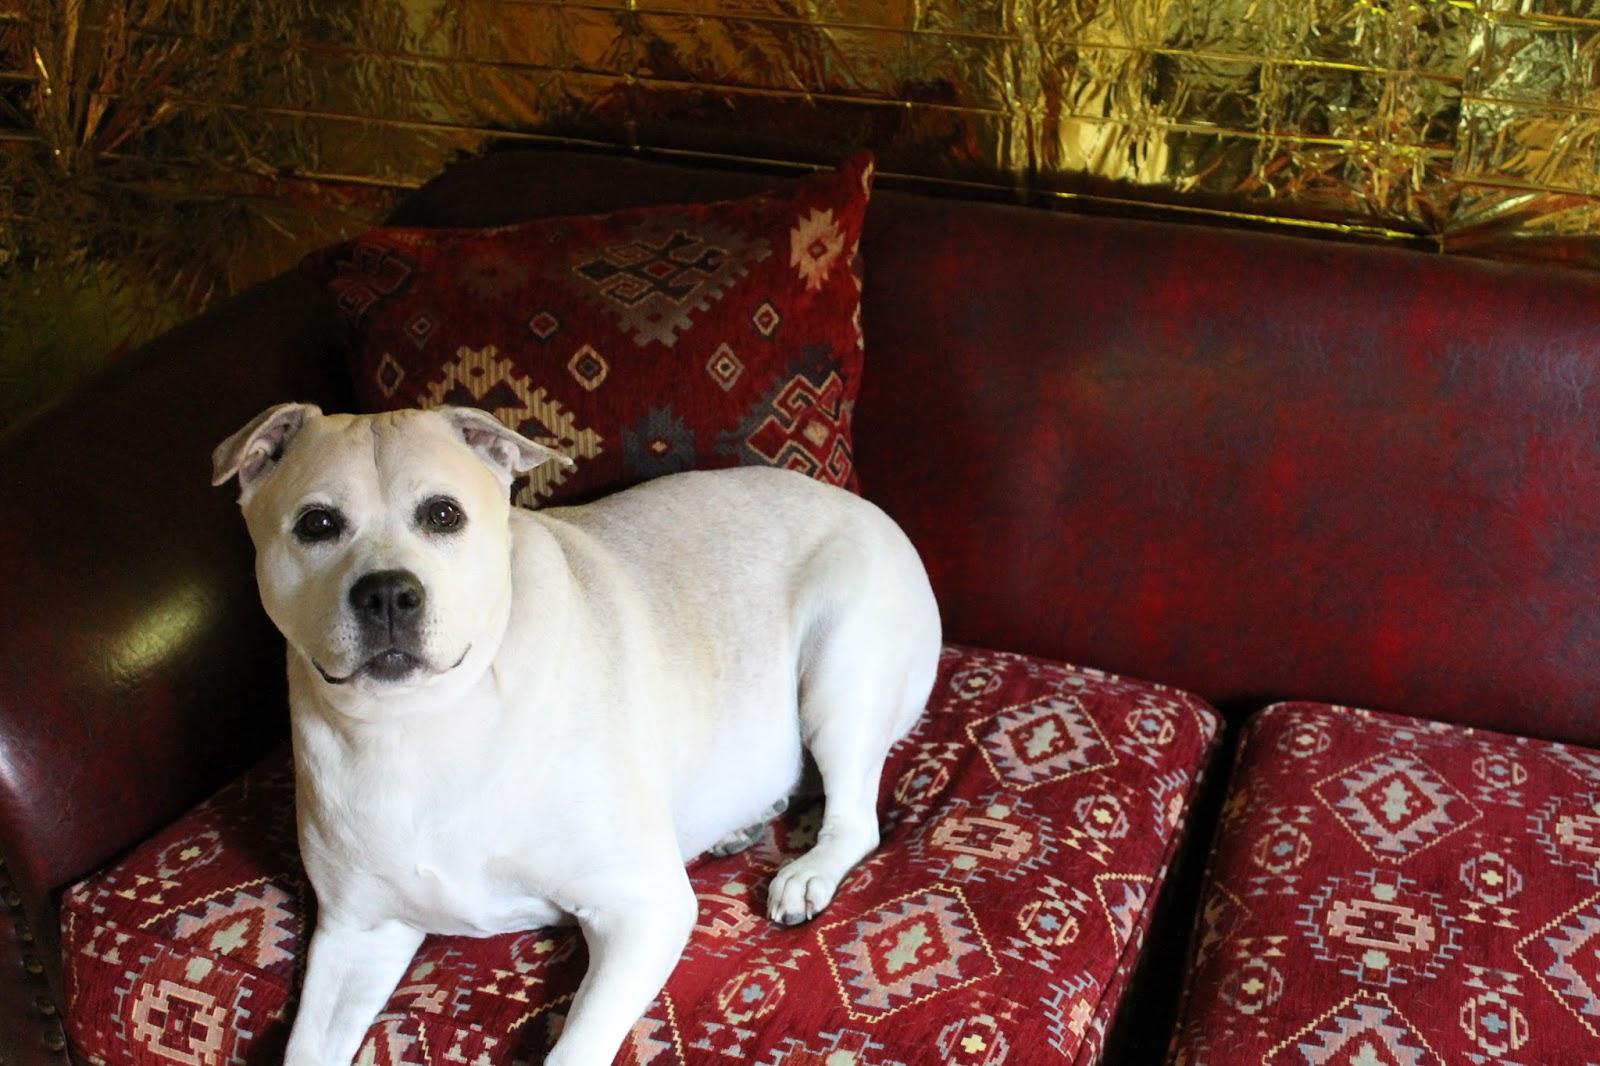 justine wynne gacy diy eine goldene wand f r die goldene ra. Black Bedroom Furniture Sets. Home Design Ideas